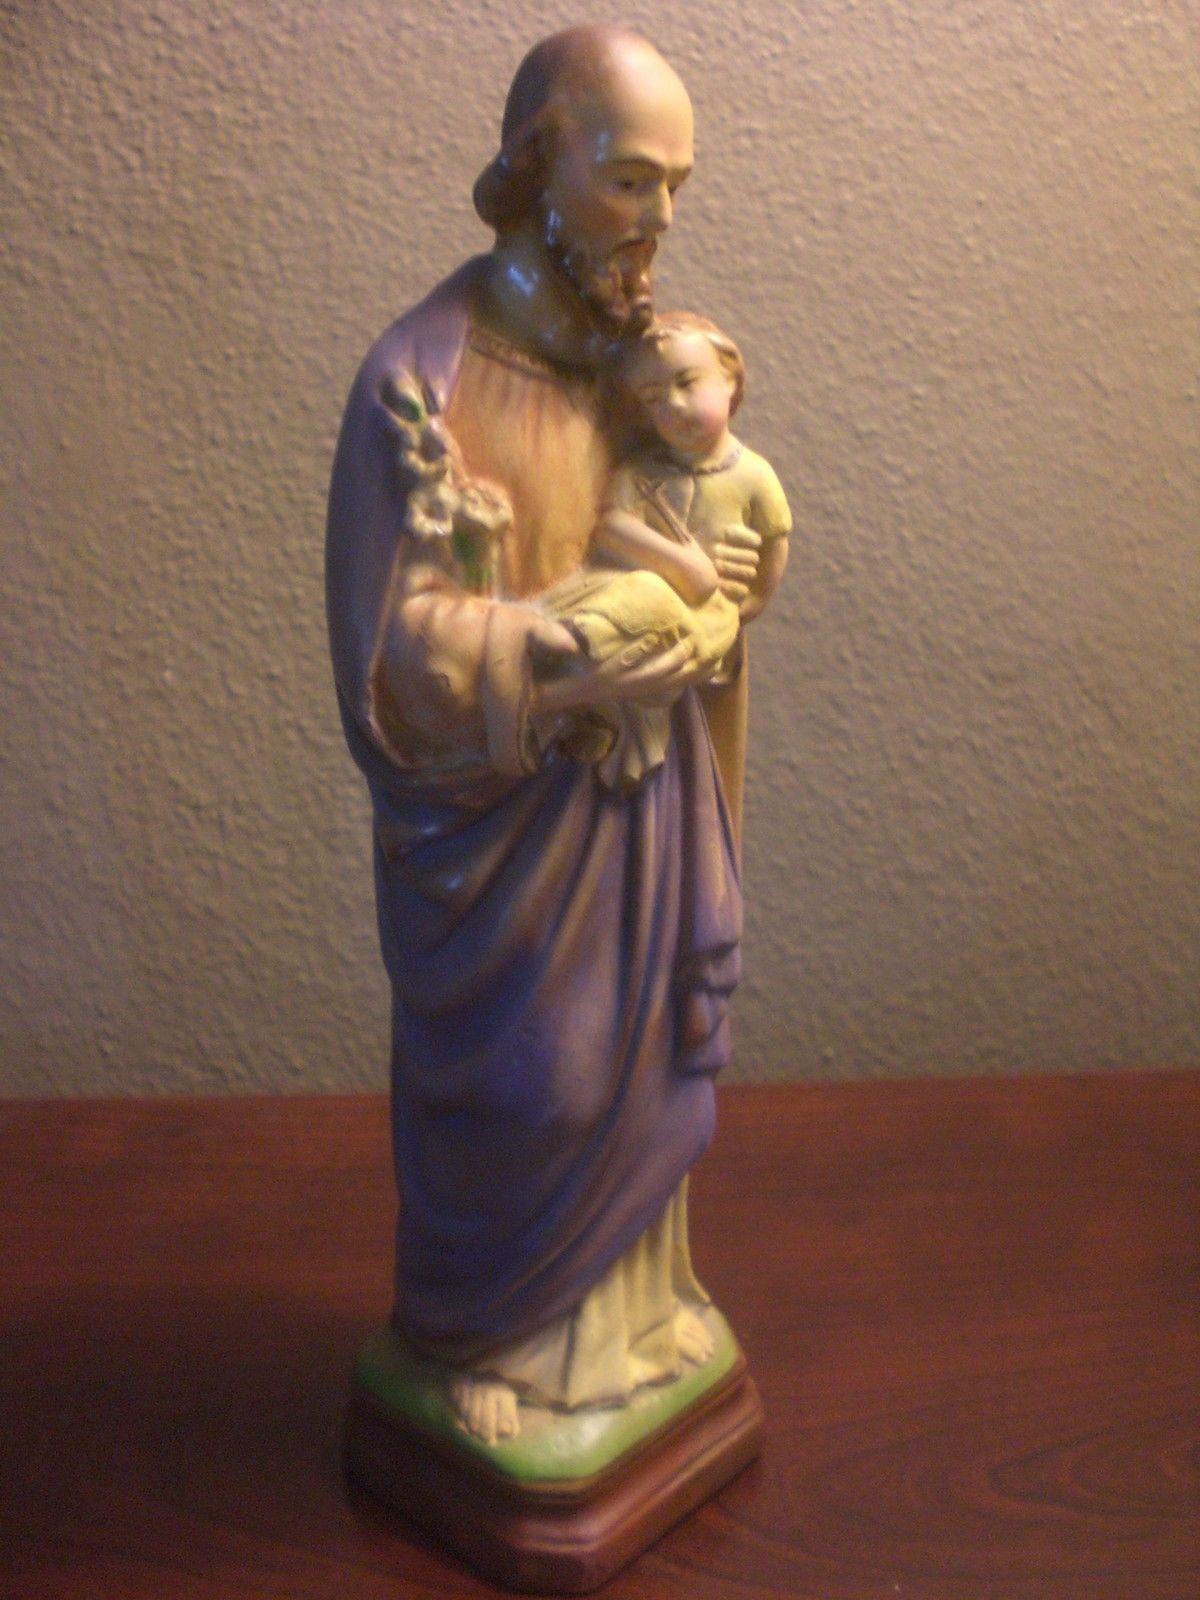 Vintage St Joseph Statue From St Joseph School In New